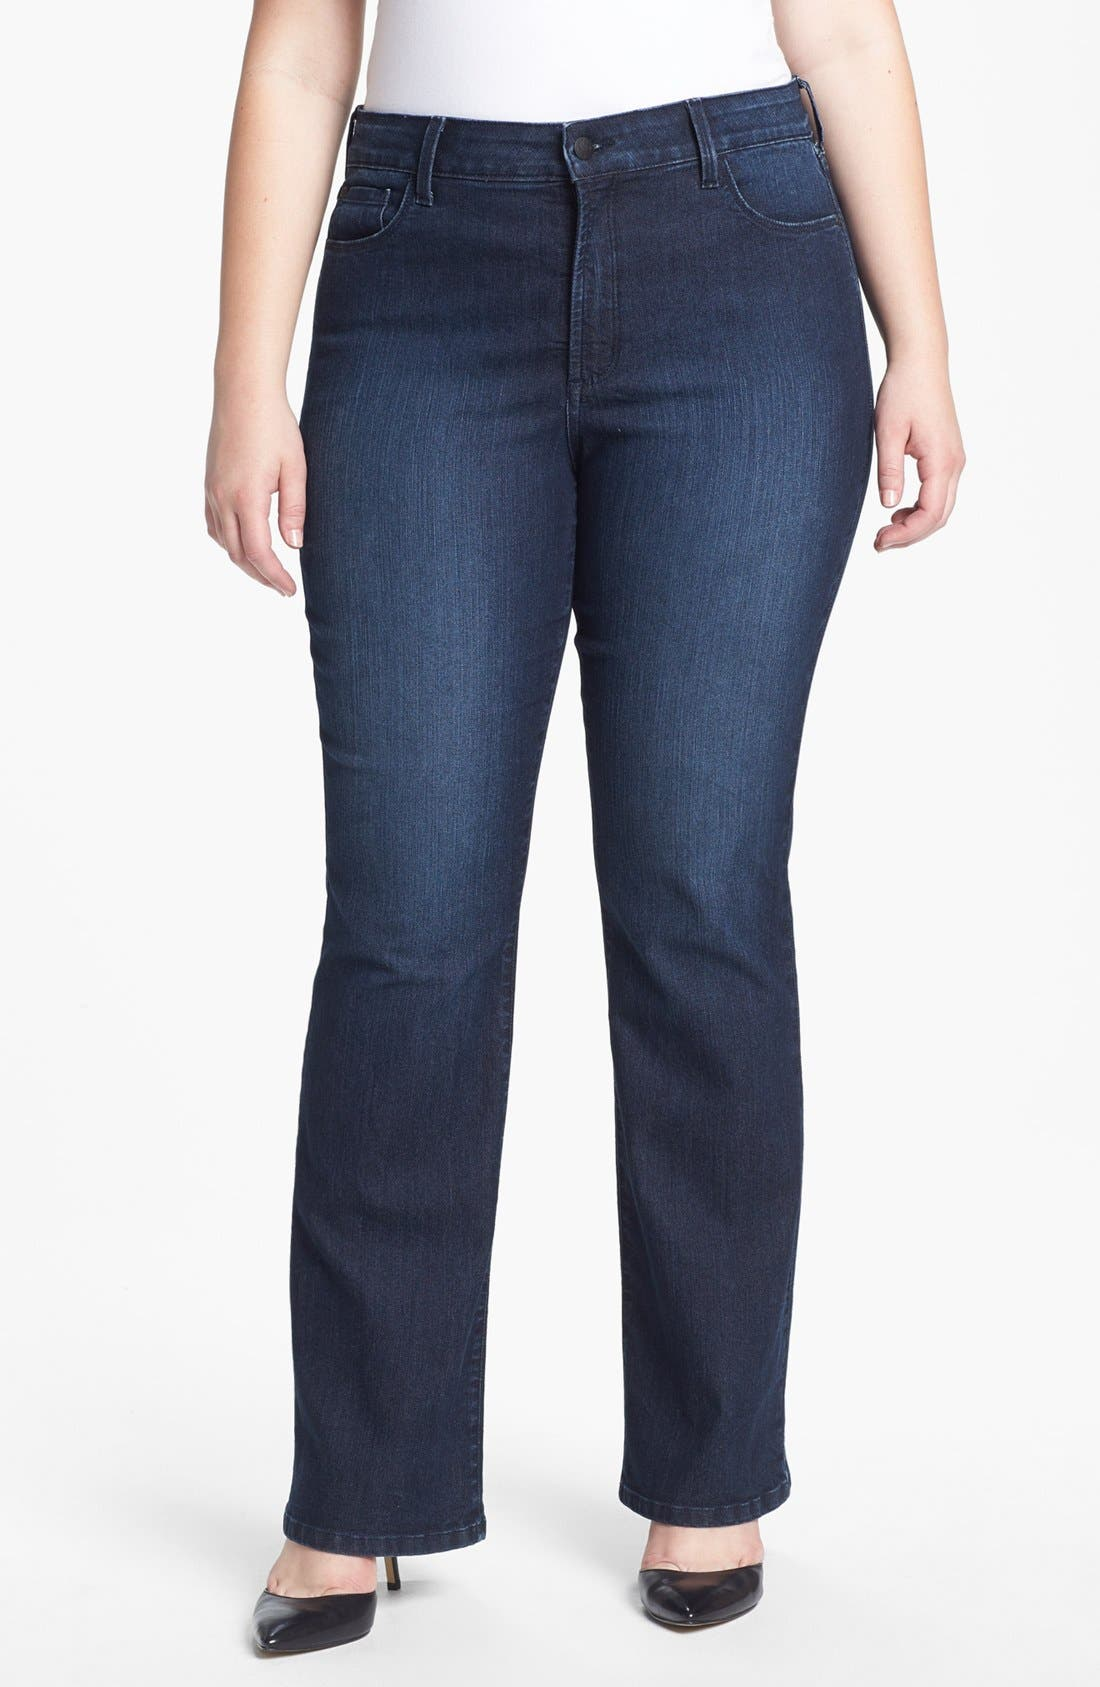 Main Image - NYDJ 'Barbara' Bootcut Jeans (Dana Point) (Plus Size)